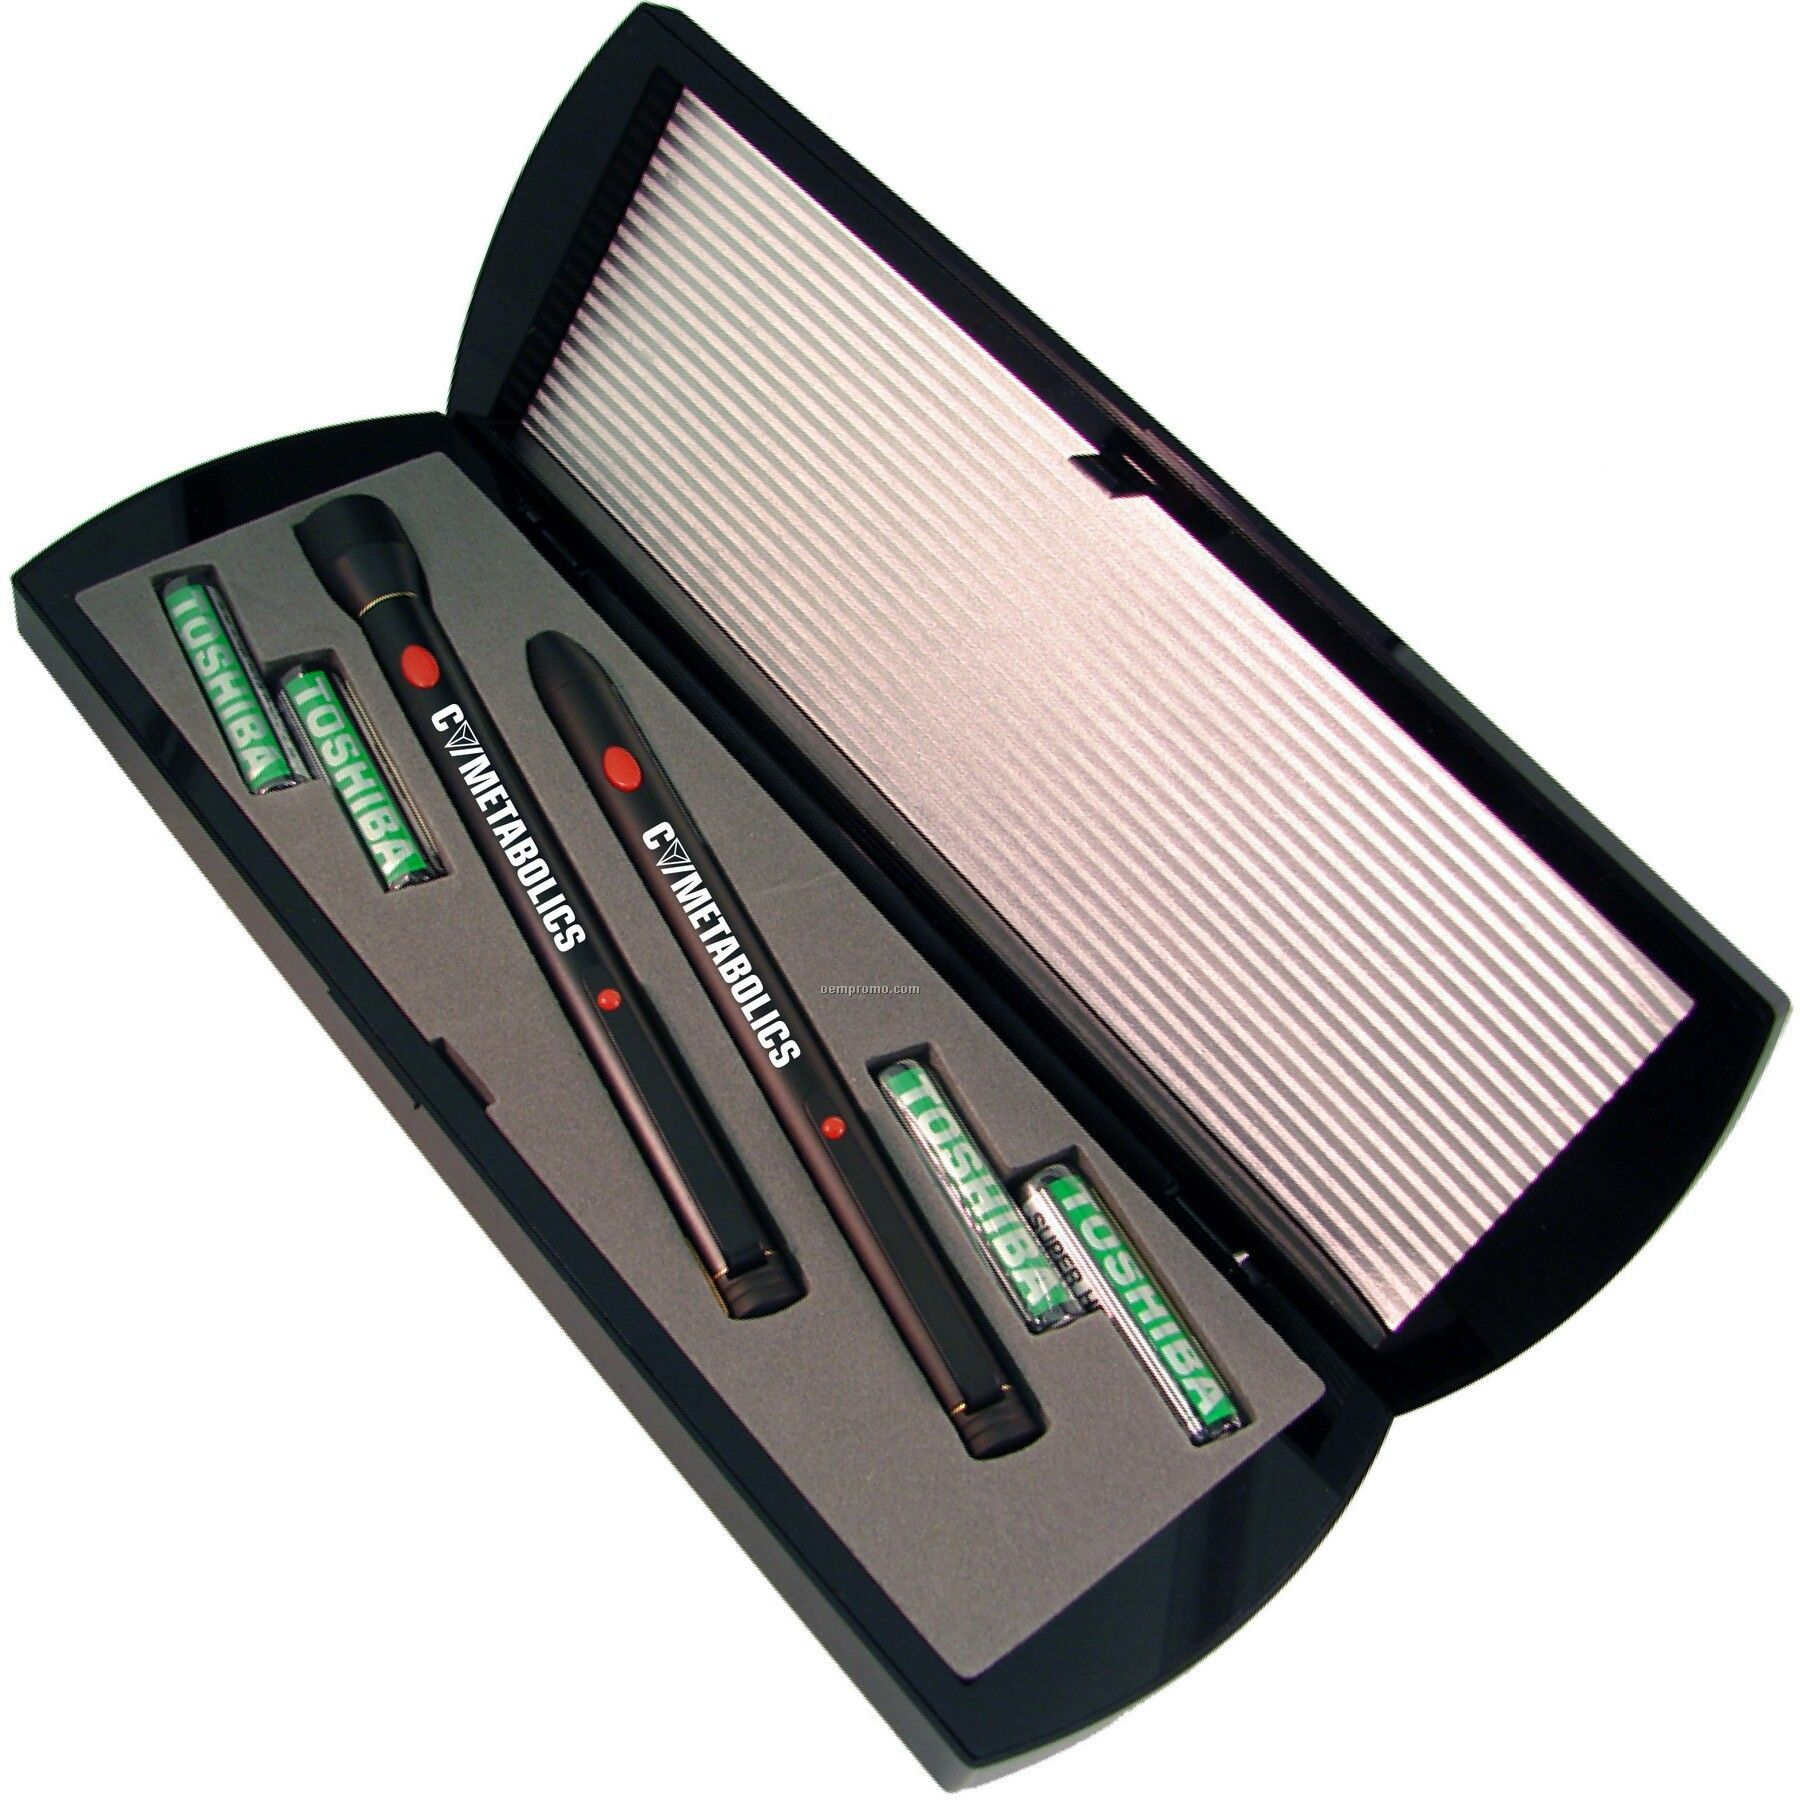 Alpec Spectra Pointer And Flashlight Set